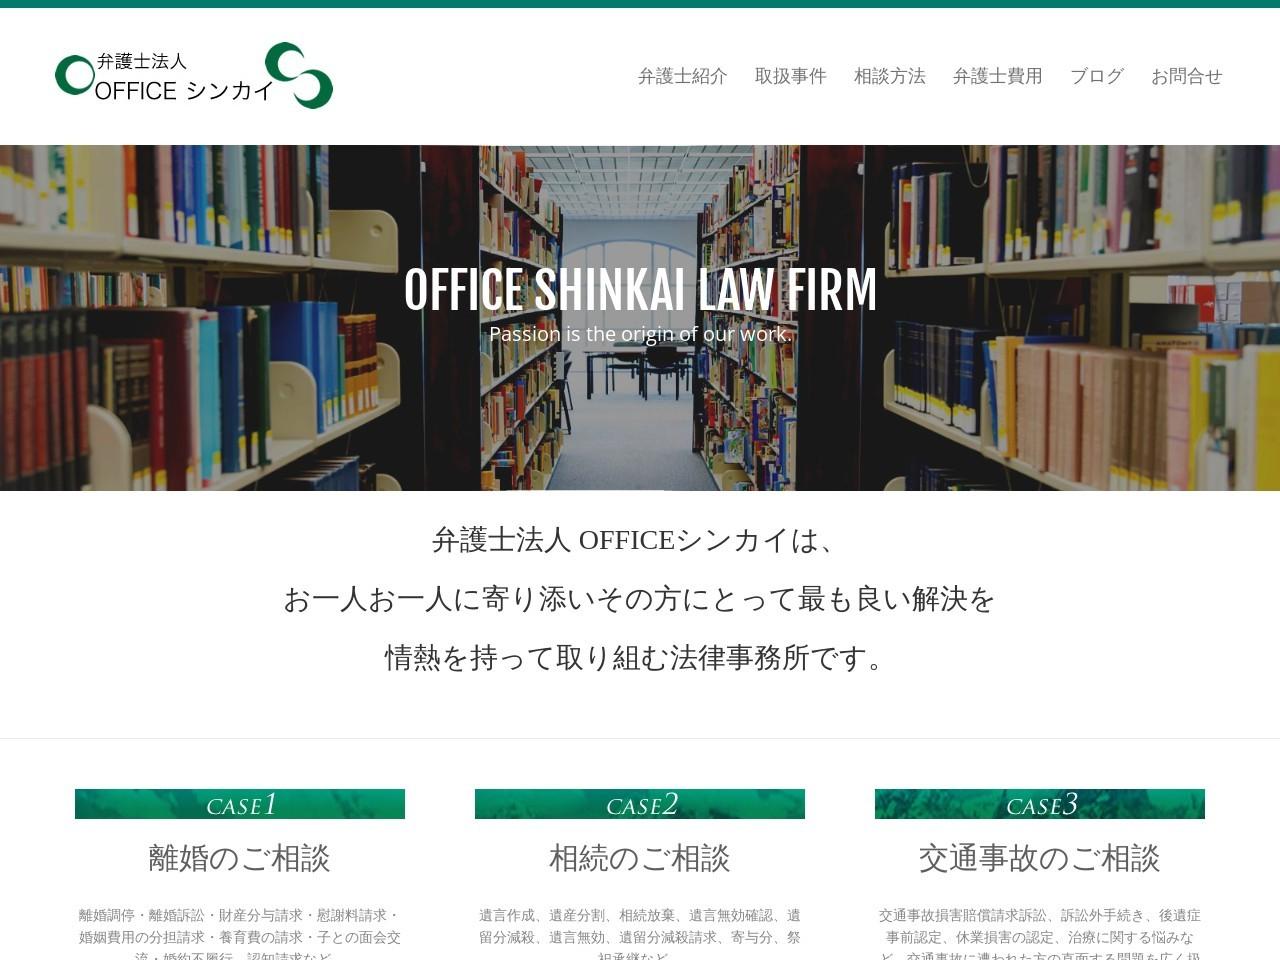 OFFICEシンカイ(弁護士法人)